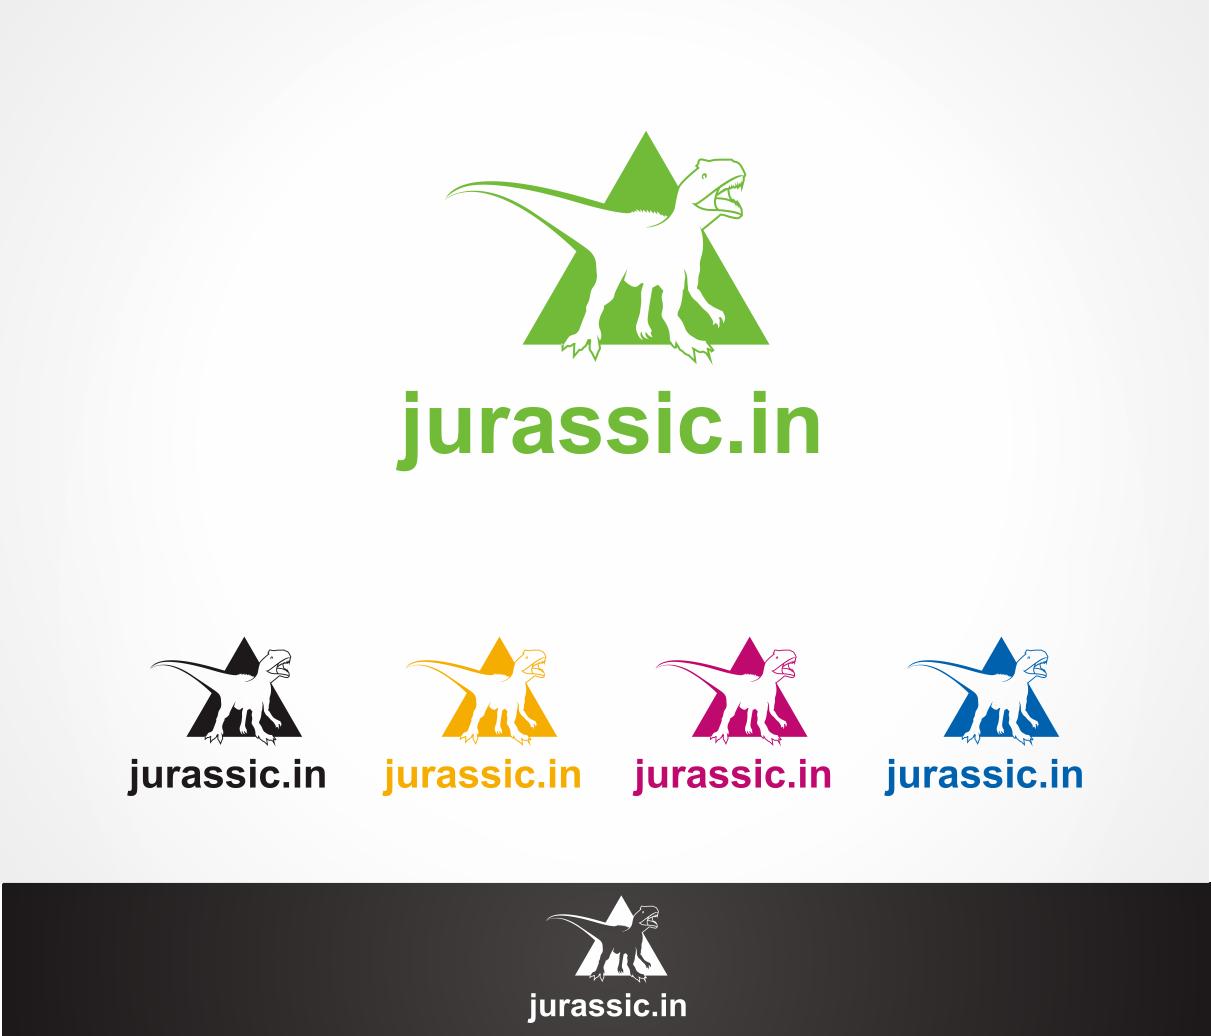 Logo Design by Armada Jamaluddin - Entry No. 42 in the Logo Design Contest Unique Logo Design Wanted for jurassic.in.